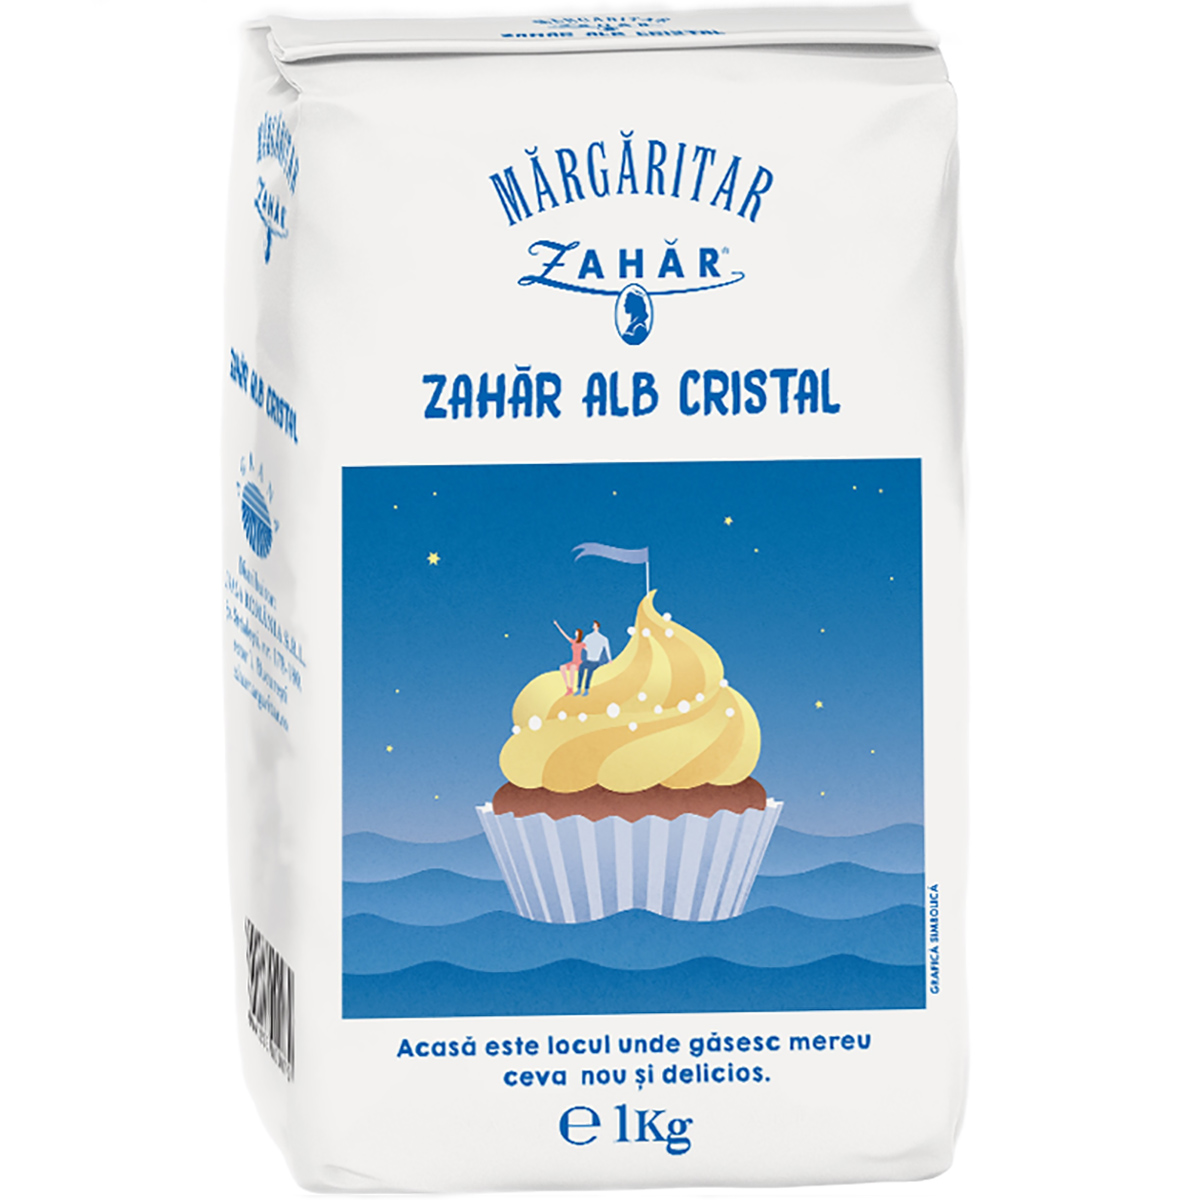 Zahar alb cristal Margaritar, 1 kg imagine